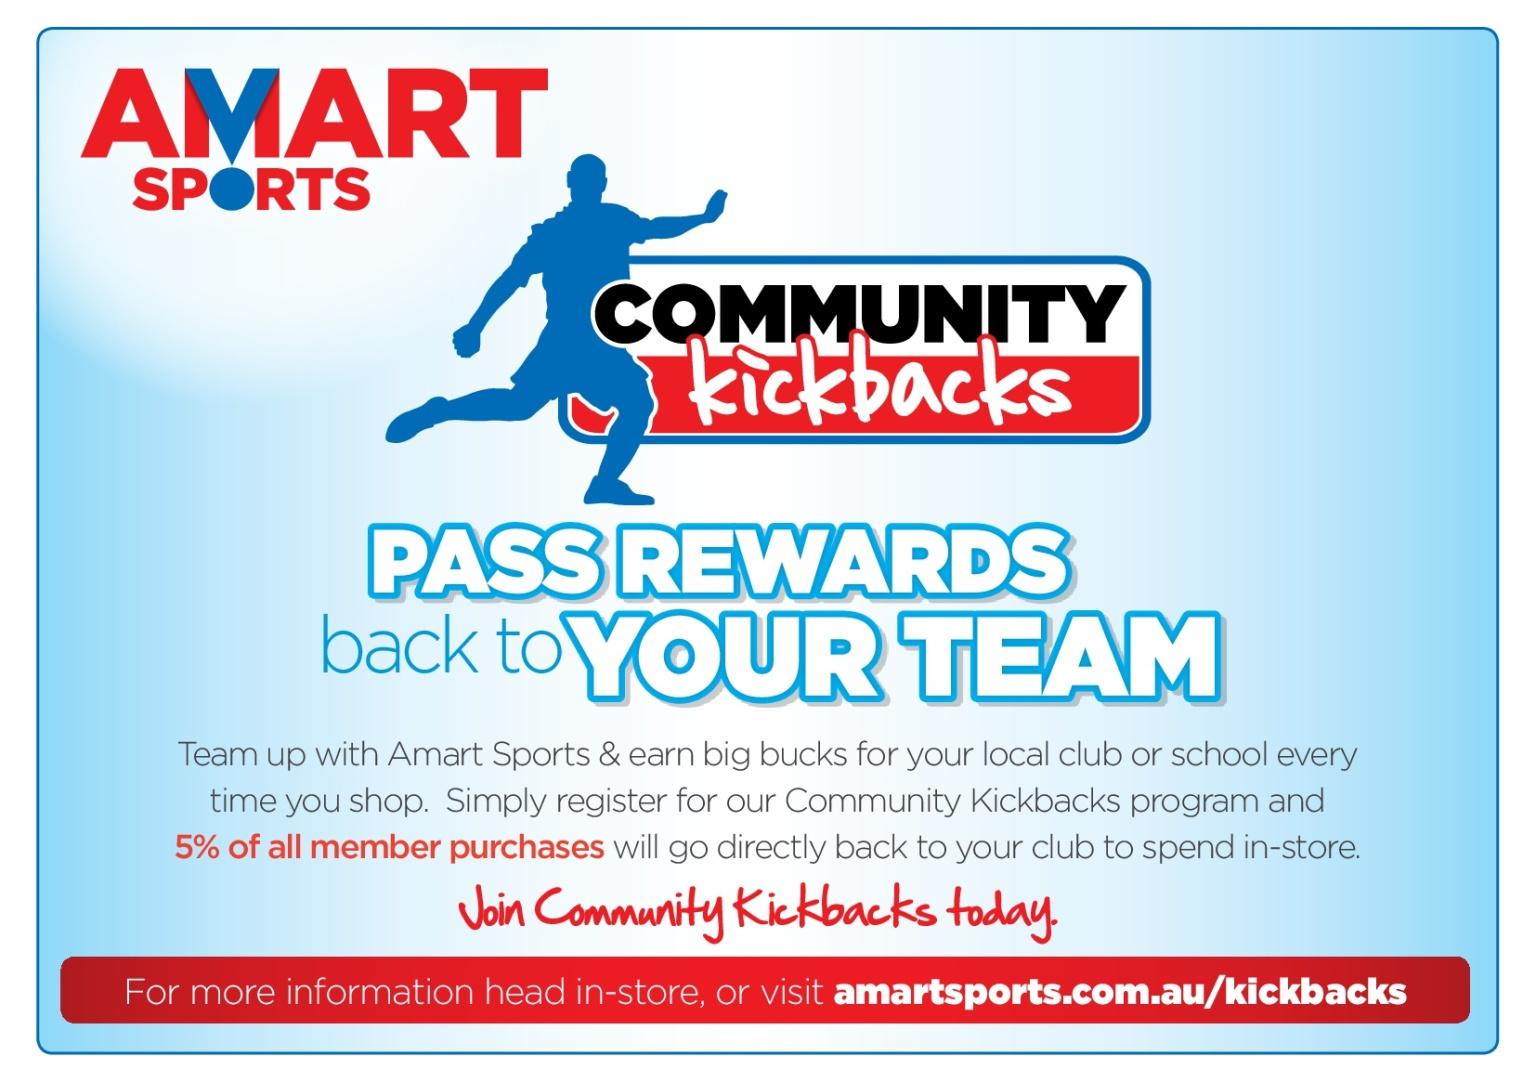 Amart Sports Community Kickbacks